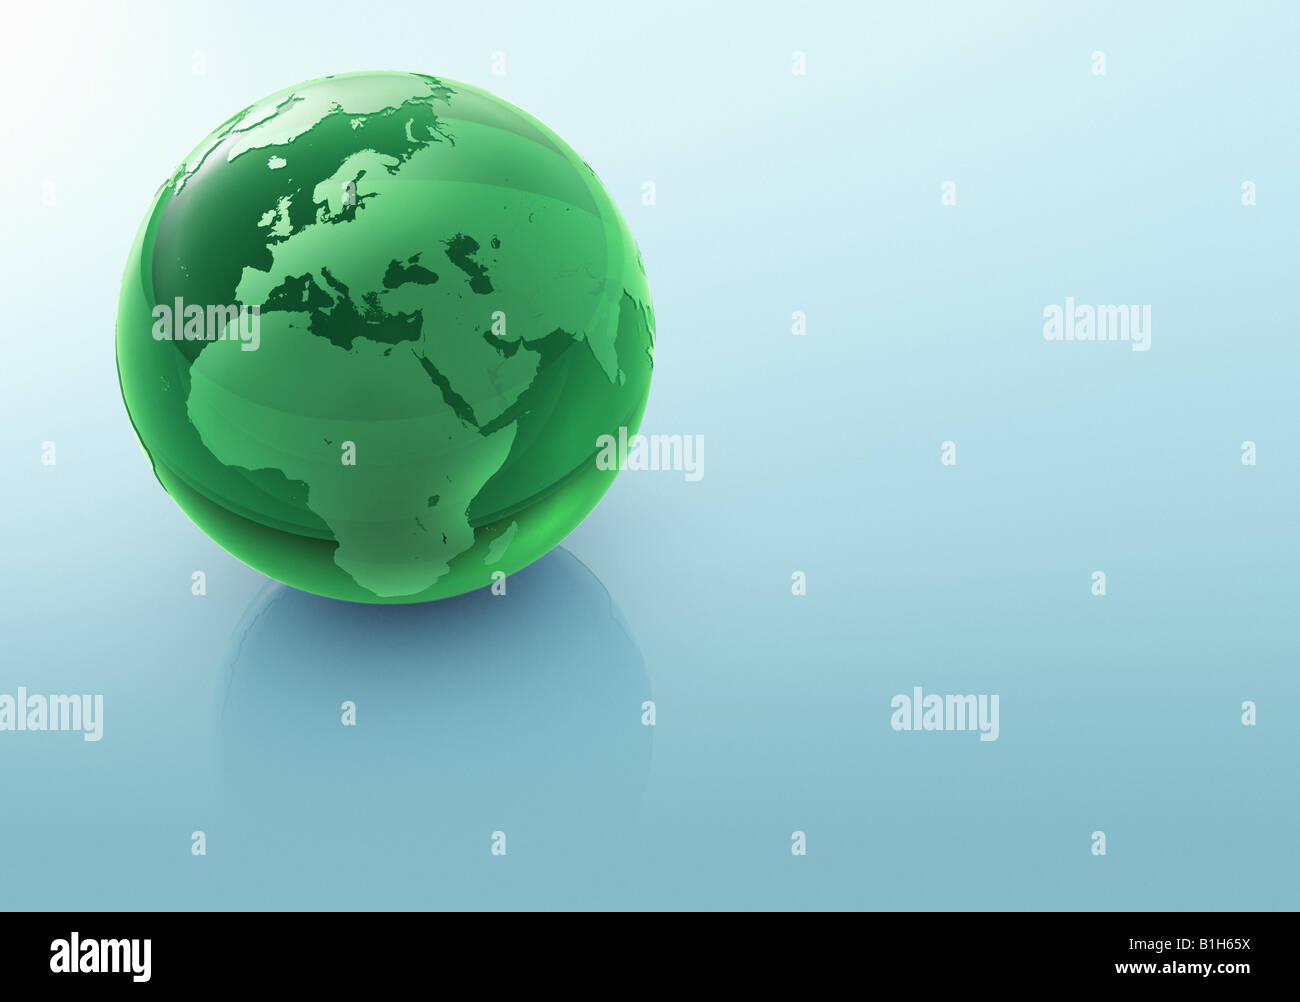 Computer generated globe - Stock Image